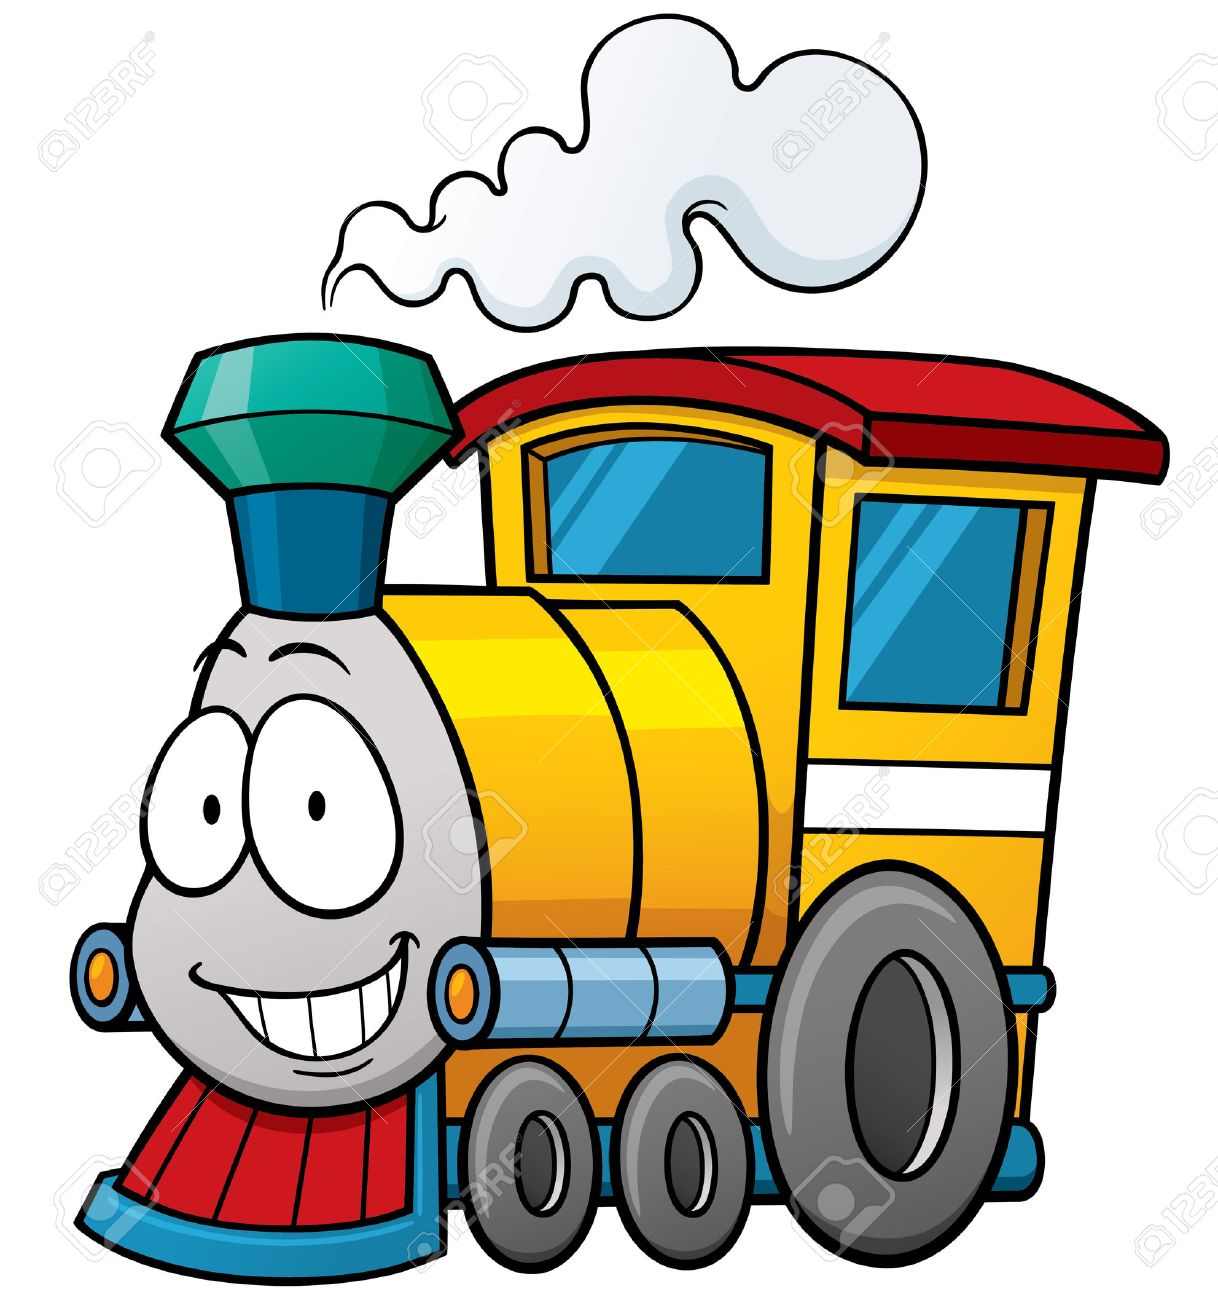 vector illustration of cartoon train royalty free cliparts vectors